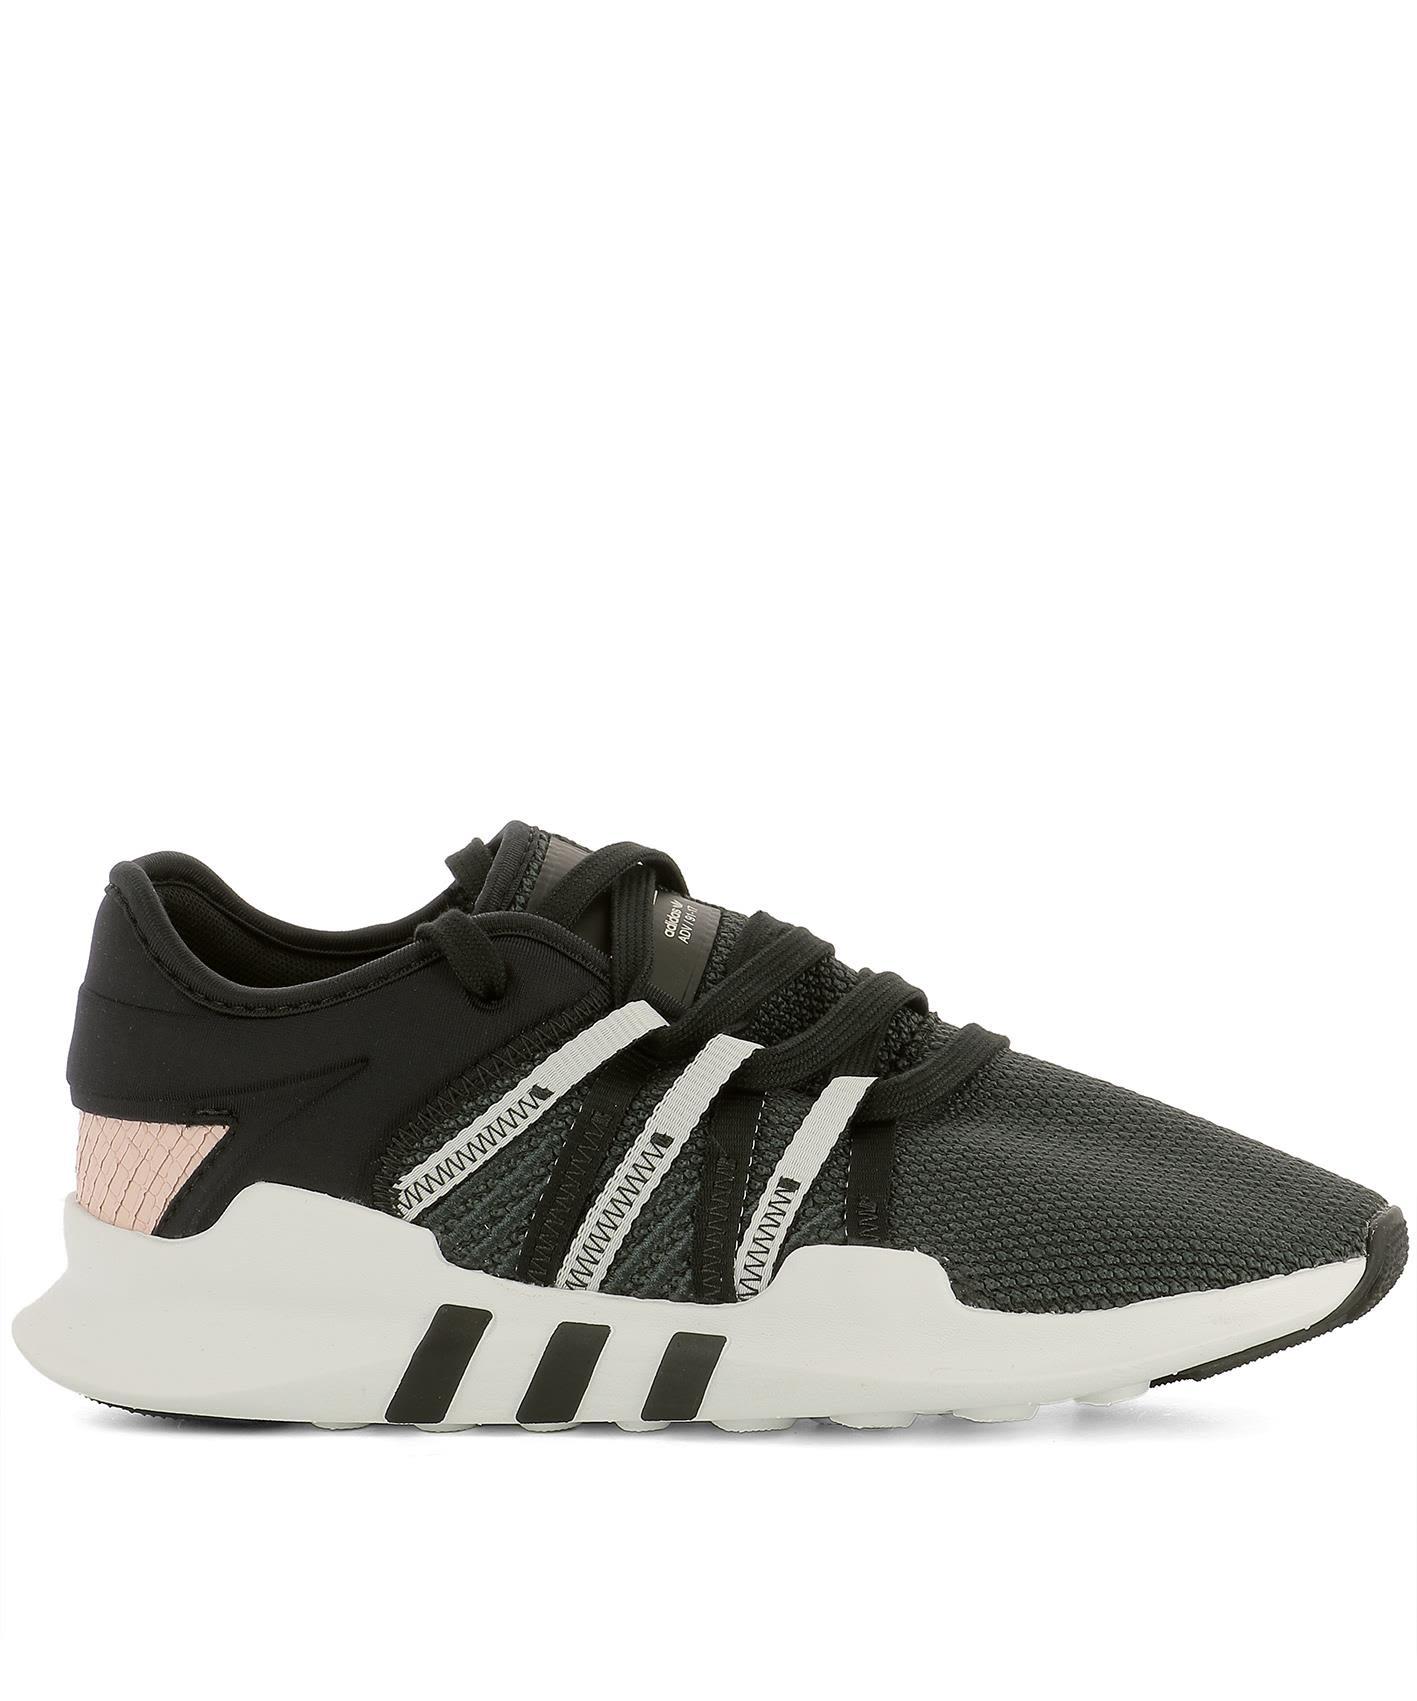 adidas black & pink eqt cushion adv trainers Bluewater £100.00